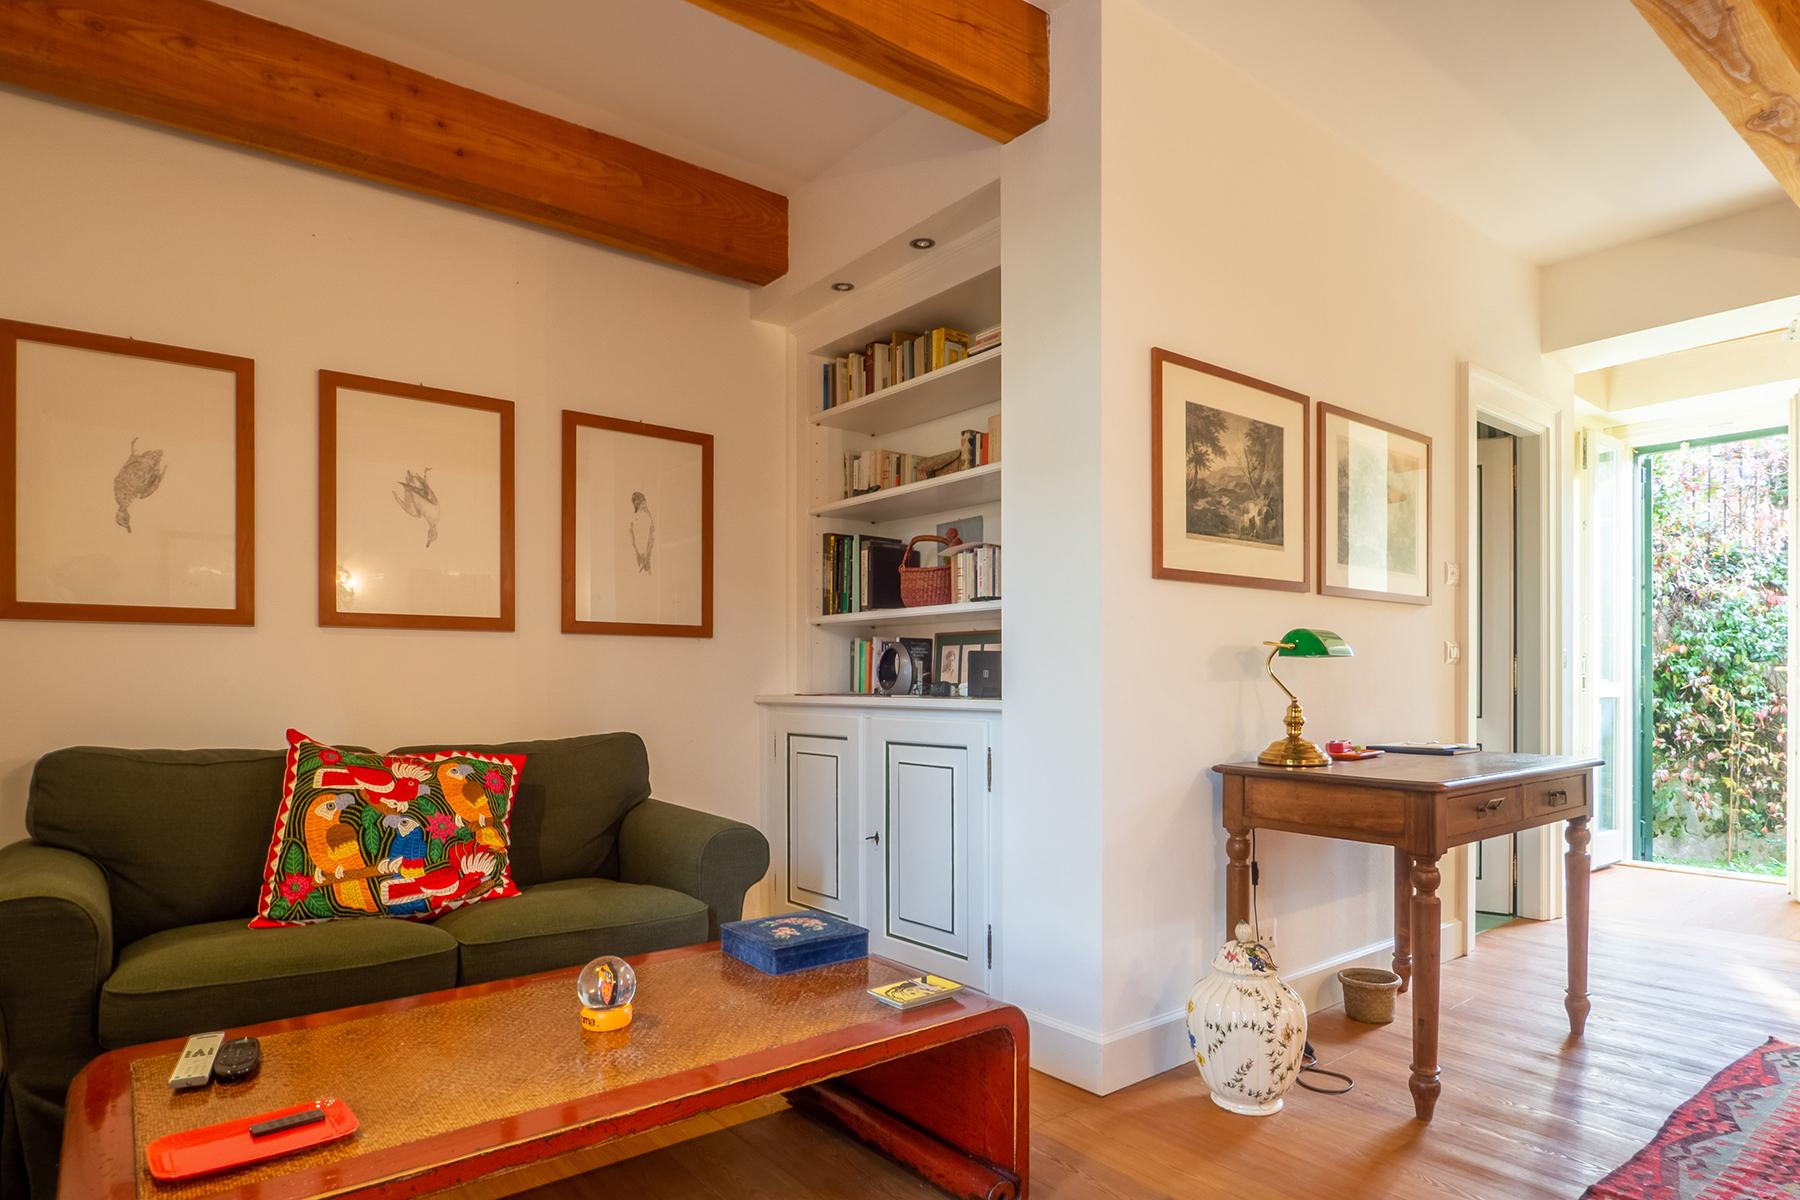 Casa indipendente in Vendita a Torino: 5 locali, 657 mq - Foto 26